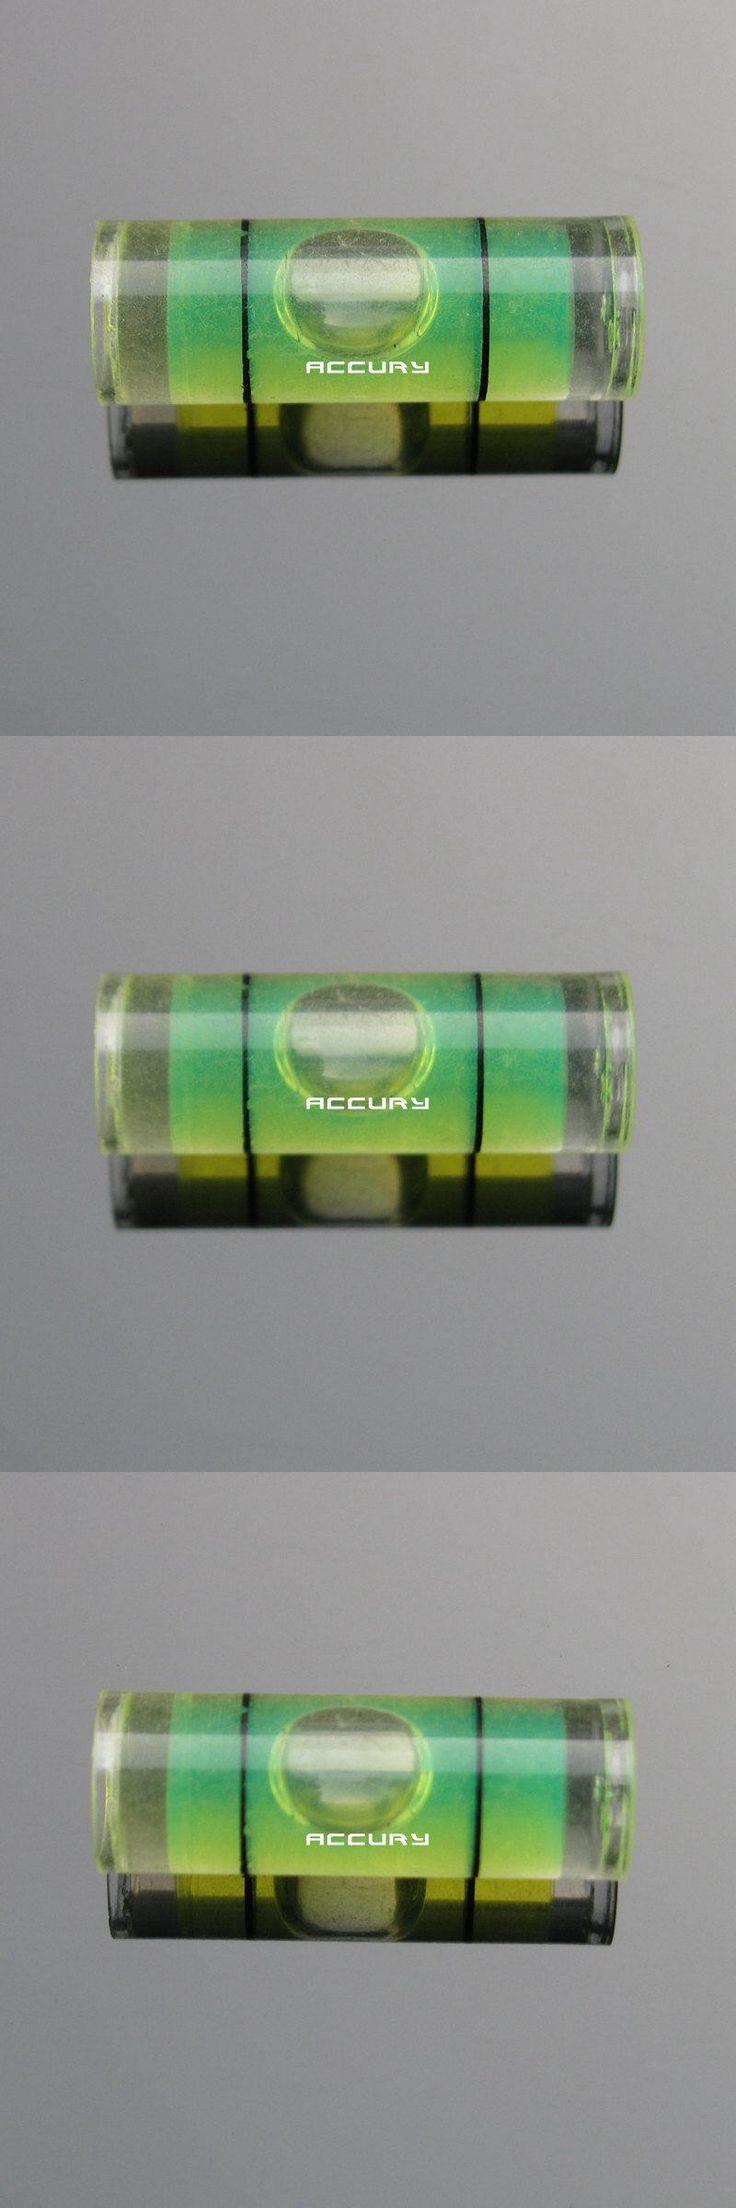 [Visit to Buy] HACCURY 1pcs 8*23mm Acrylic Tubular Spirit Level Mini Cylinder Plastic Vial water level indicator #Advertisement